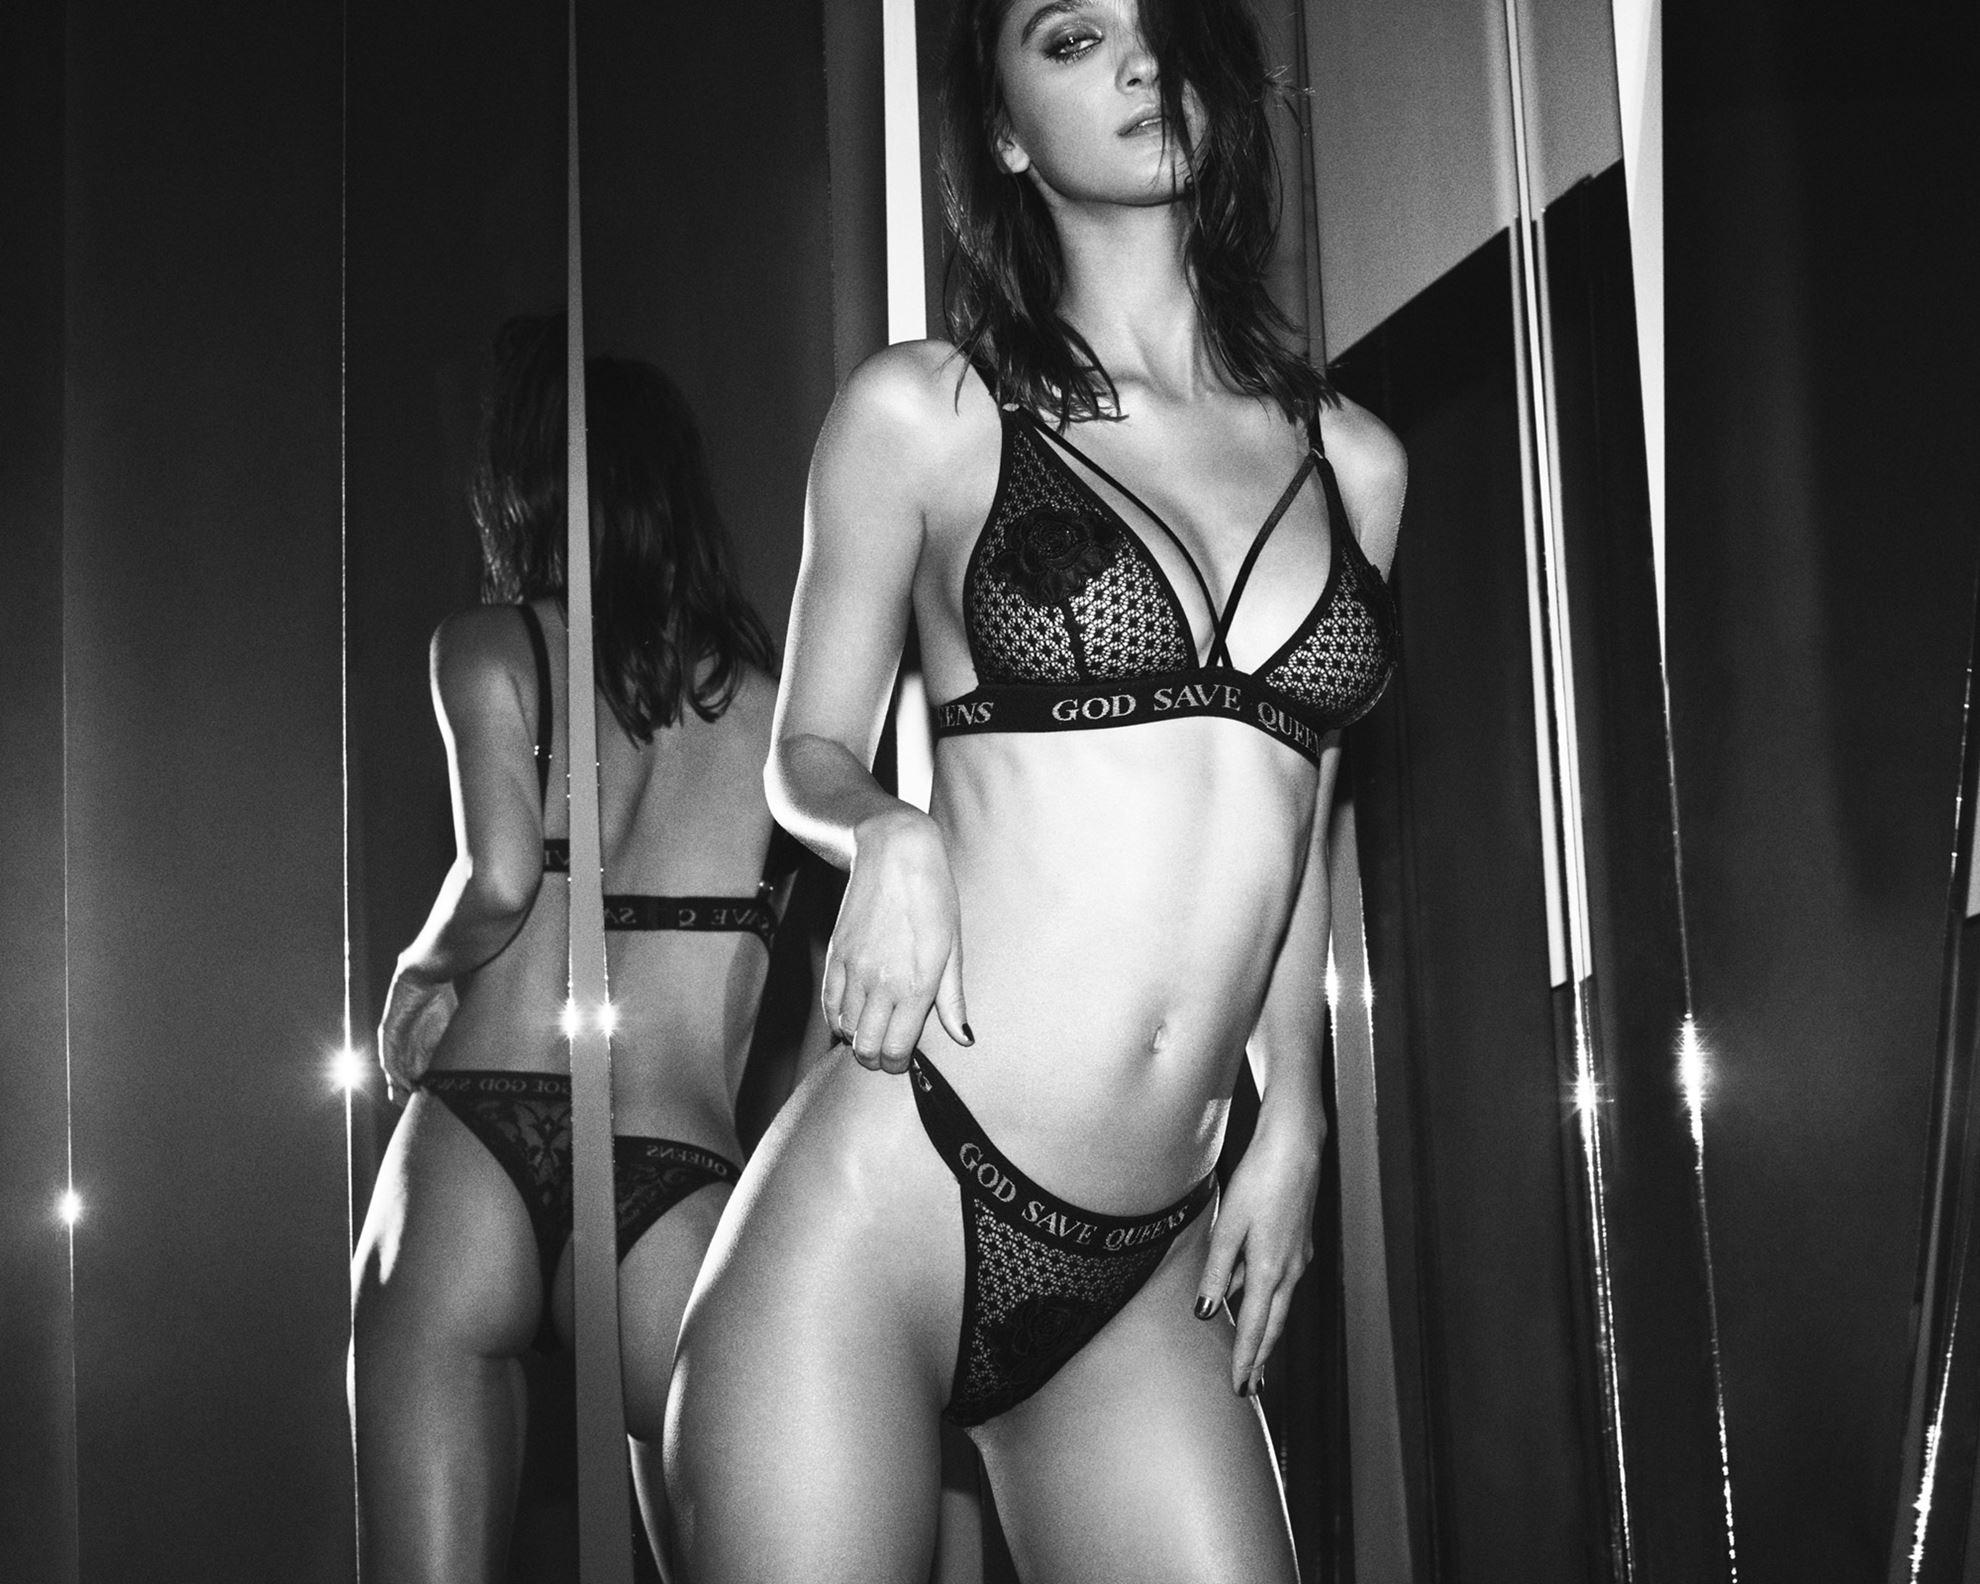 Pics Paula Bulczynska naked (48 photos), Topless, Bikini, Instagram, braless 2018